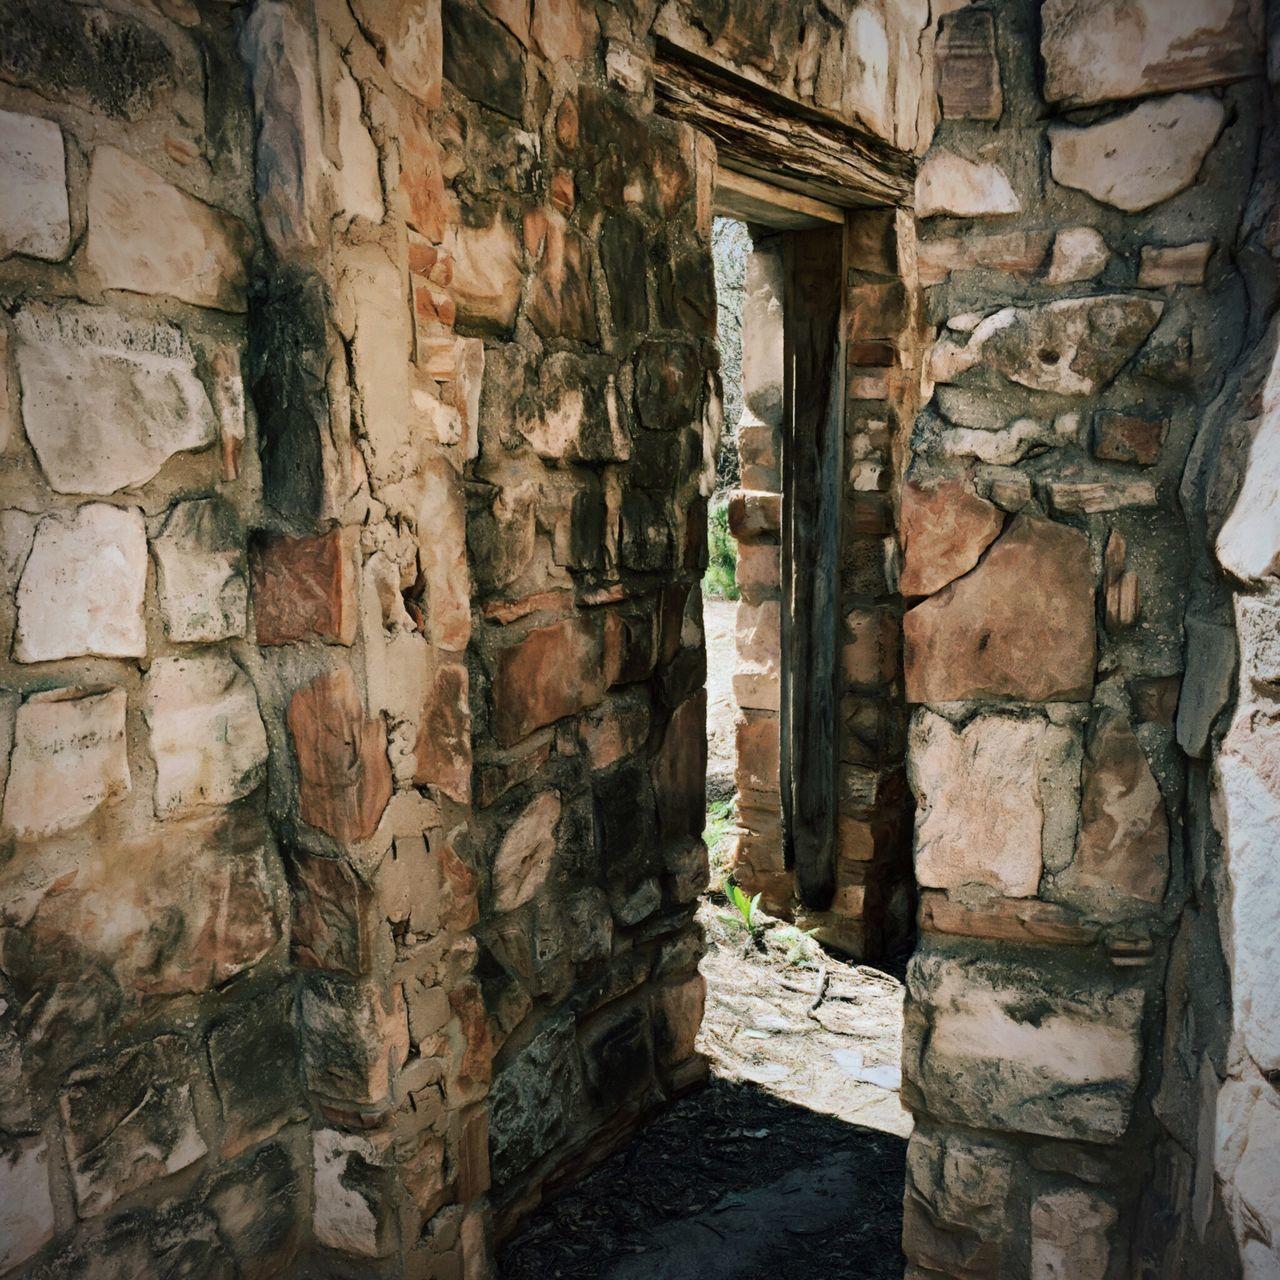 Narrow Walkway Along Stone Walls